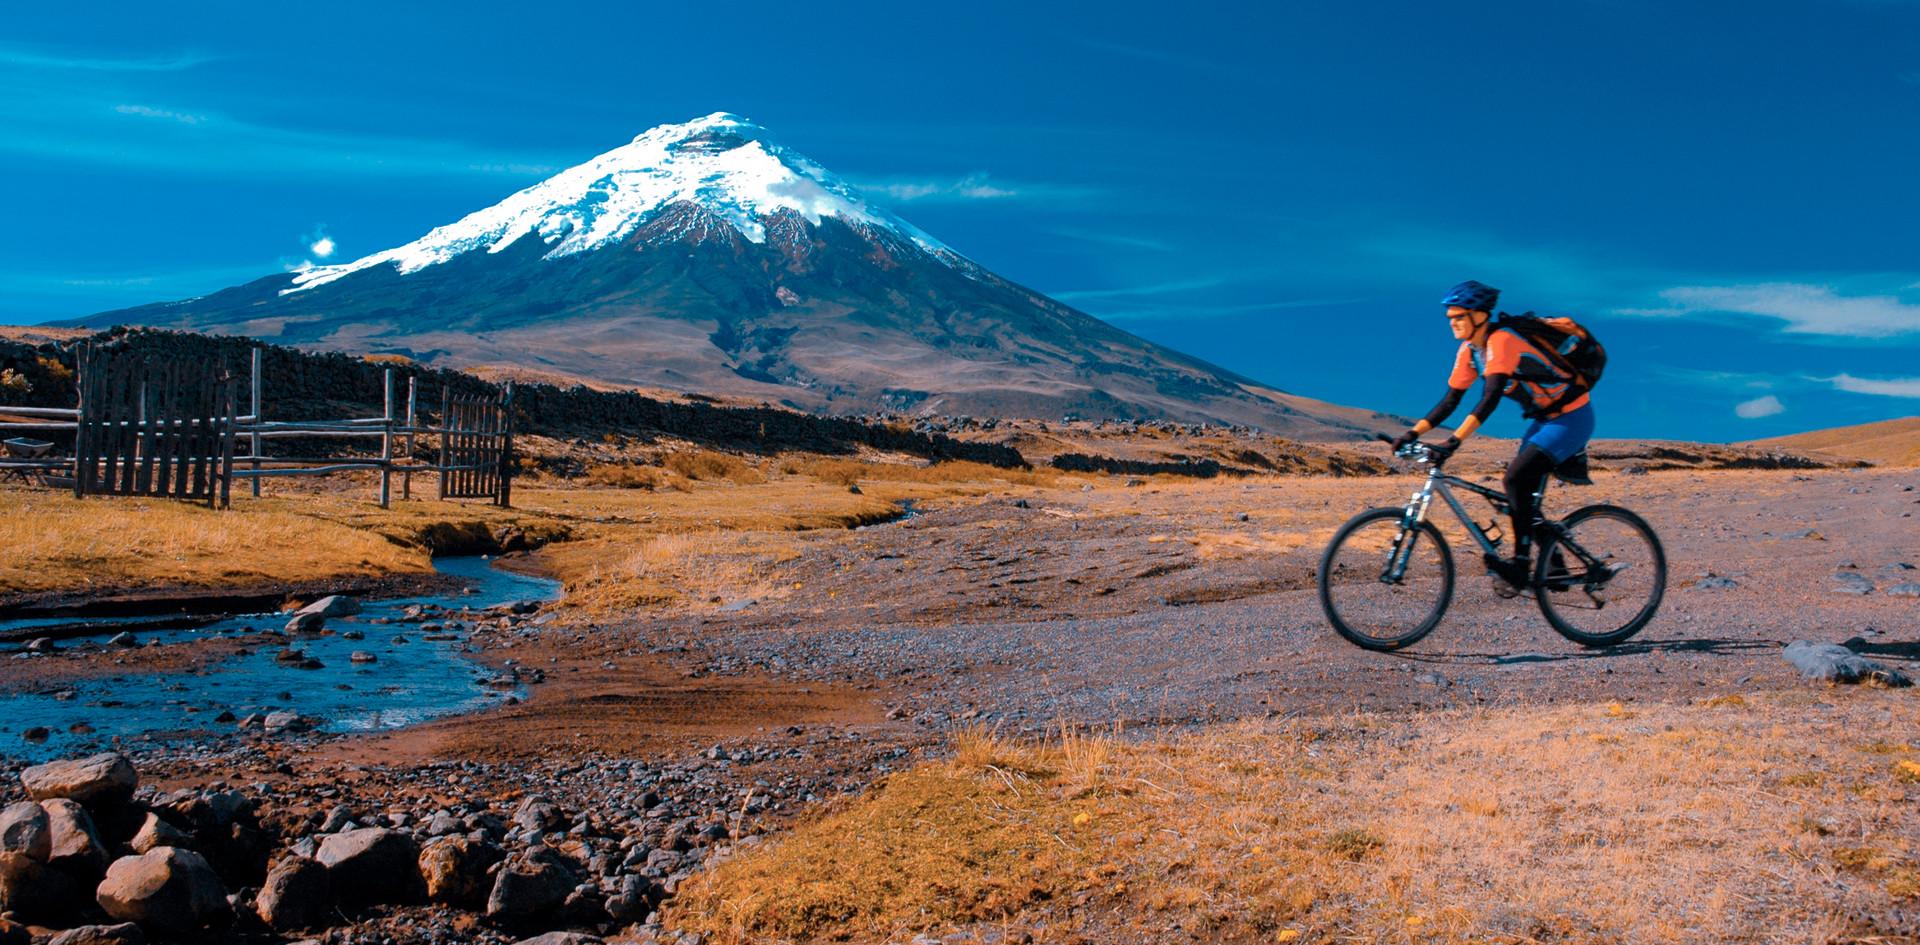 Biking at Cotopaxi.jpg